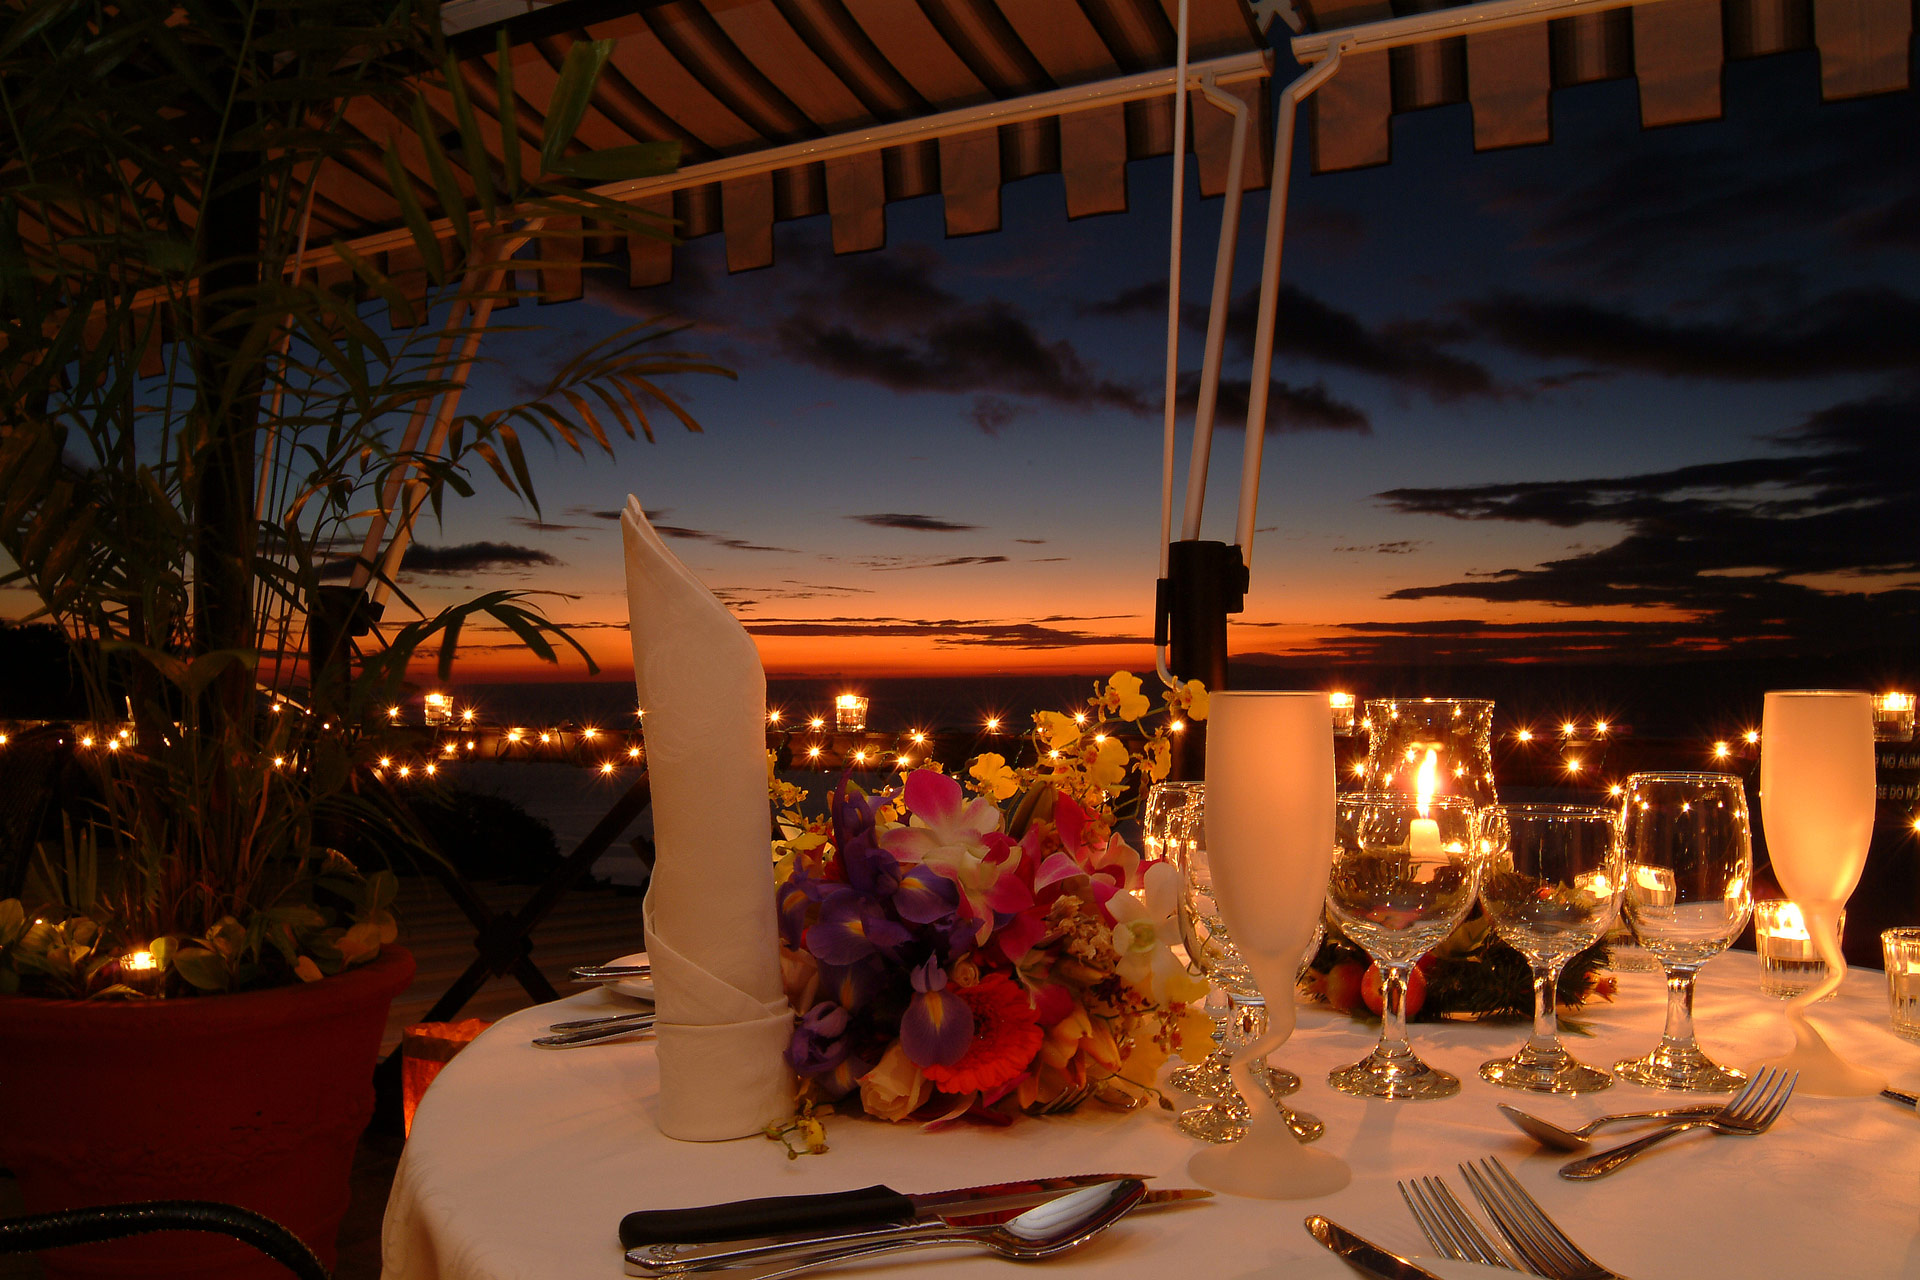 View from Mirador restaurant terrasse